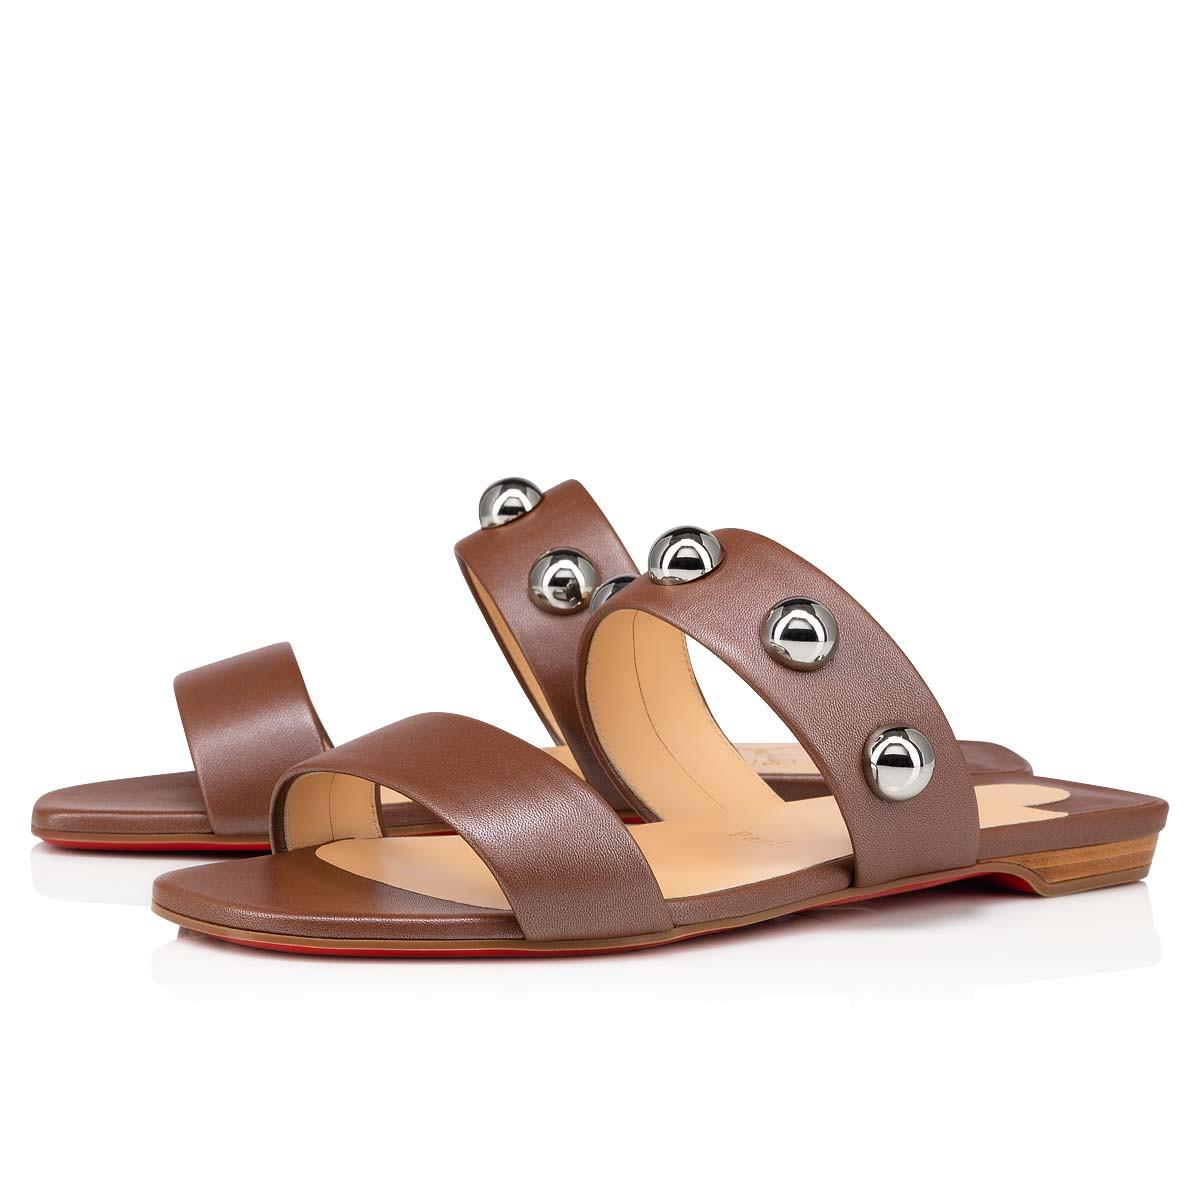 Shoes - Simple Bille Flat - Christian Louboutin